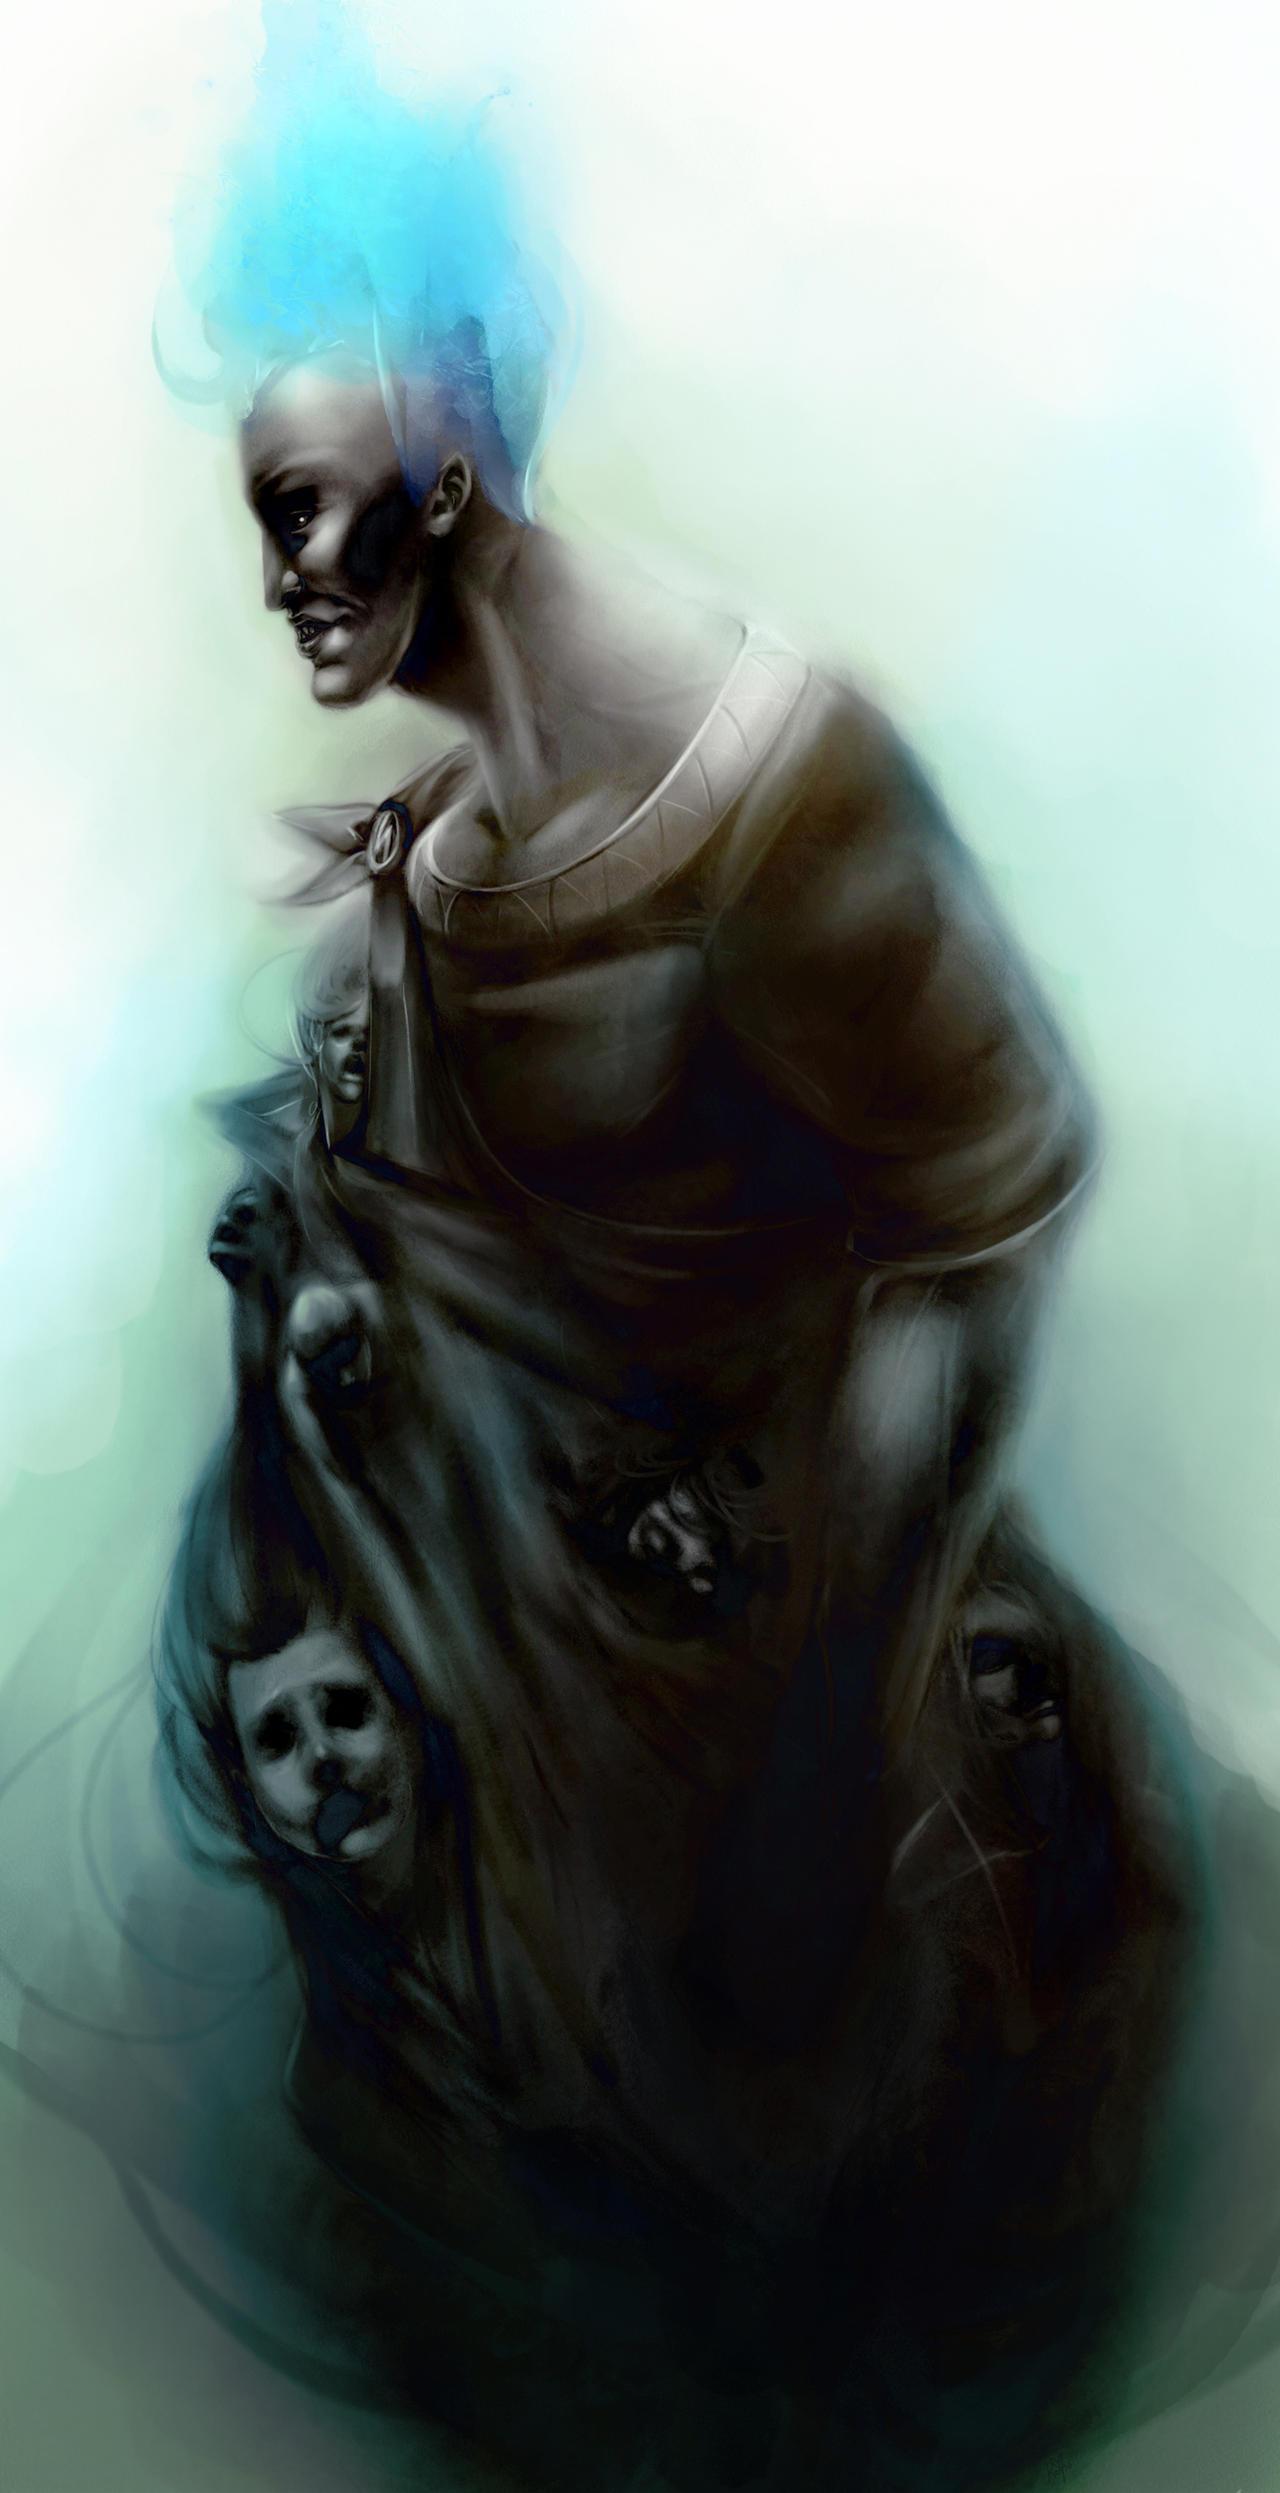 Hades by Alicechan on DeviantArt